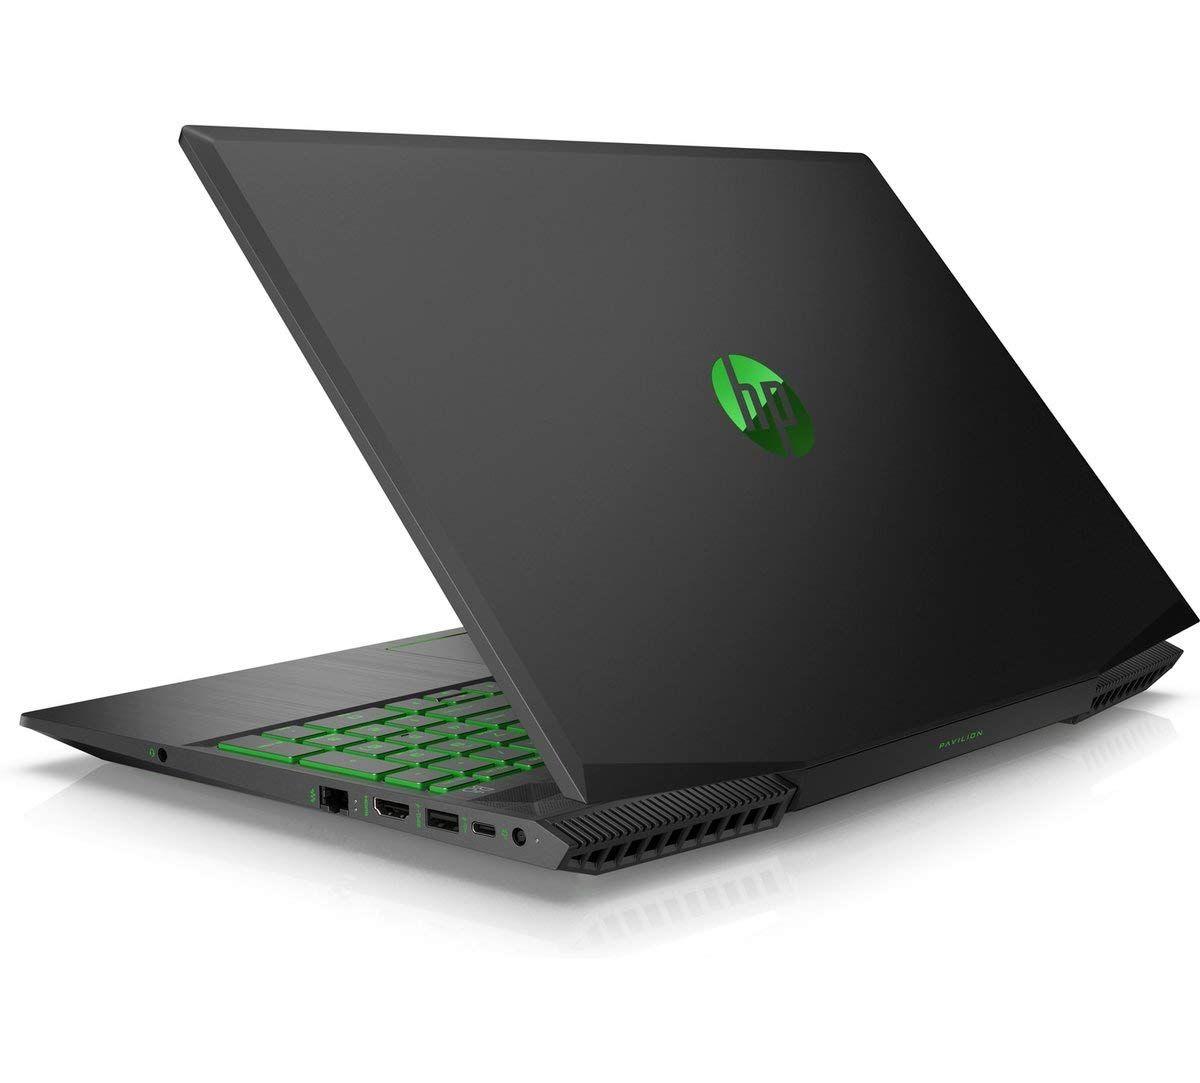 5 best gaming laptop under 1000 dollars in 2019 gamers